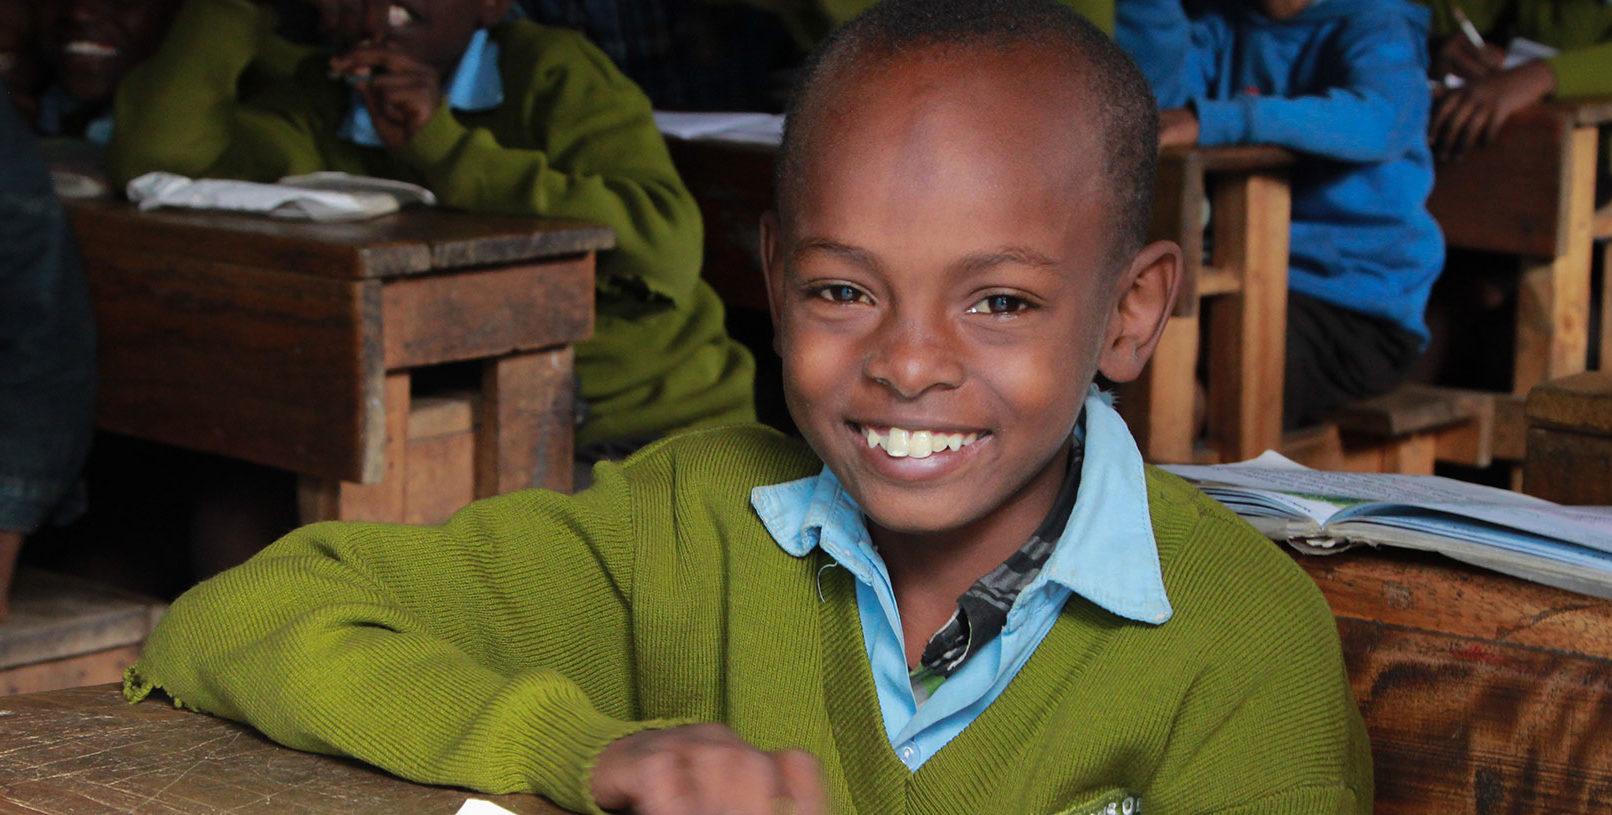 Jamal's joy returns in Kenya